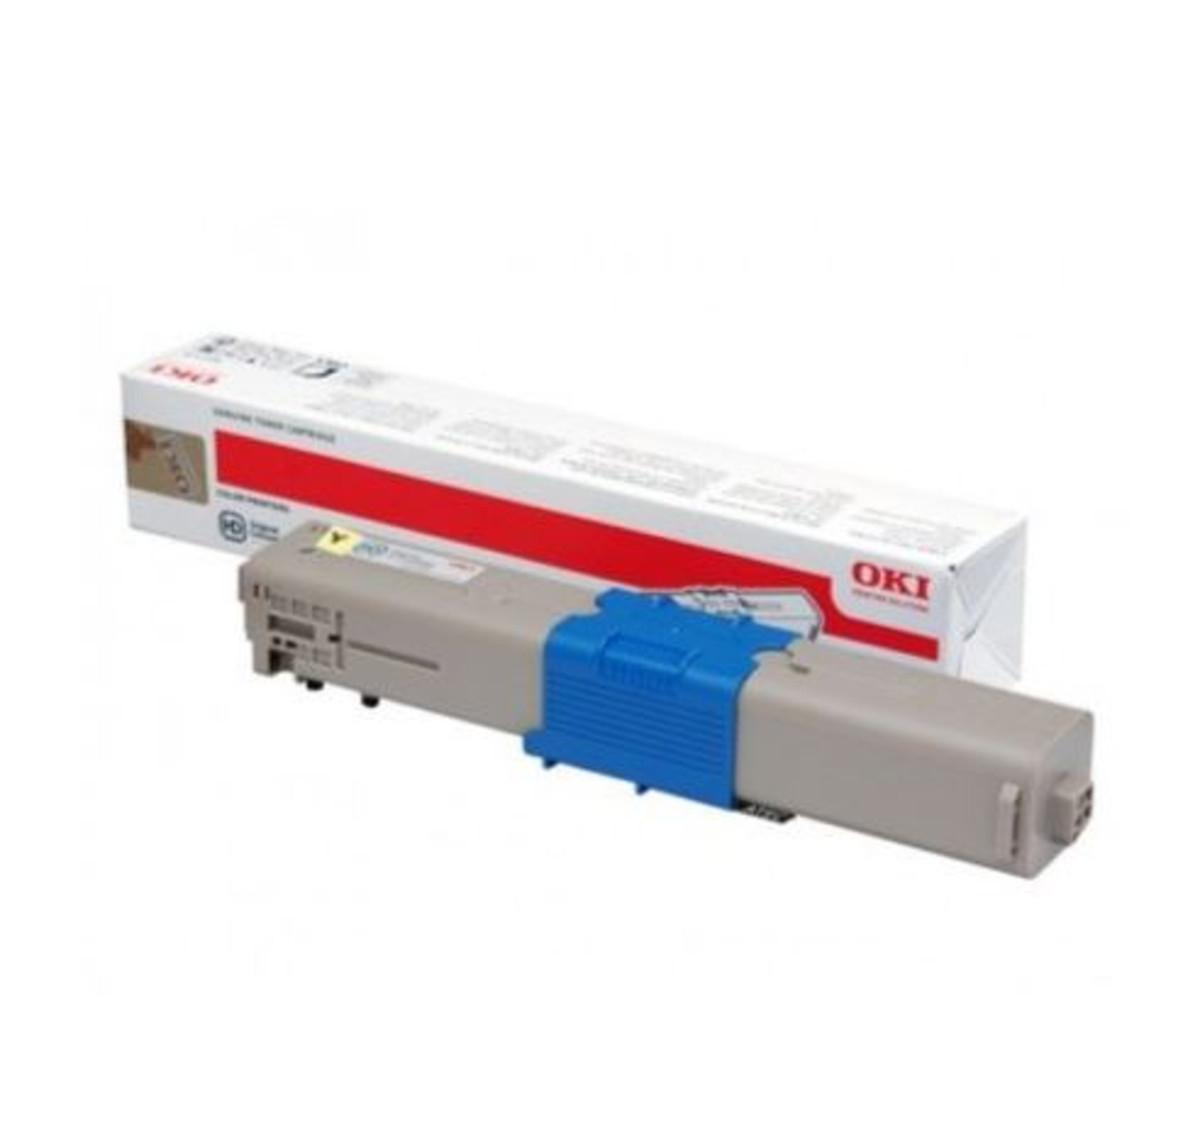 Oki 44973545 Yellow Toner Cartridge